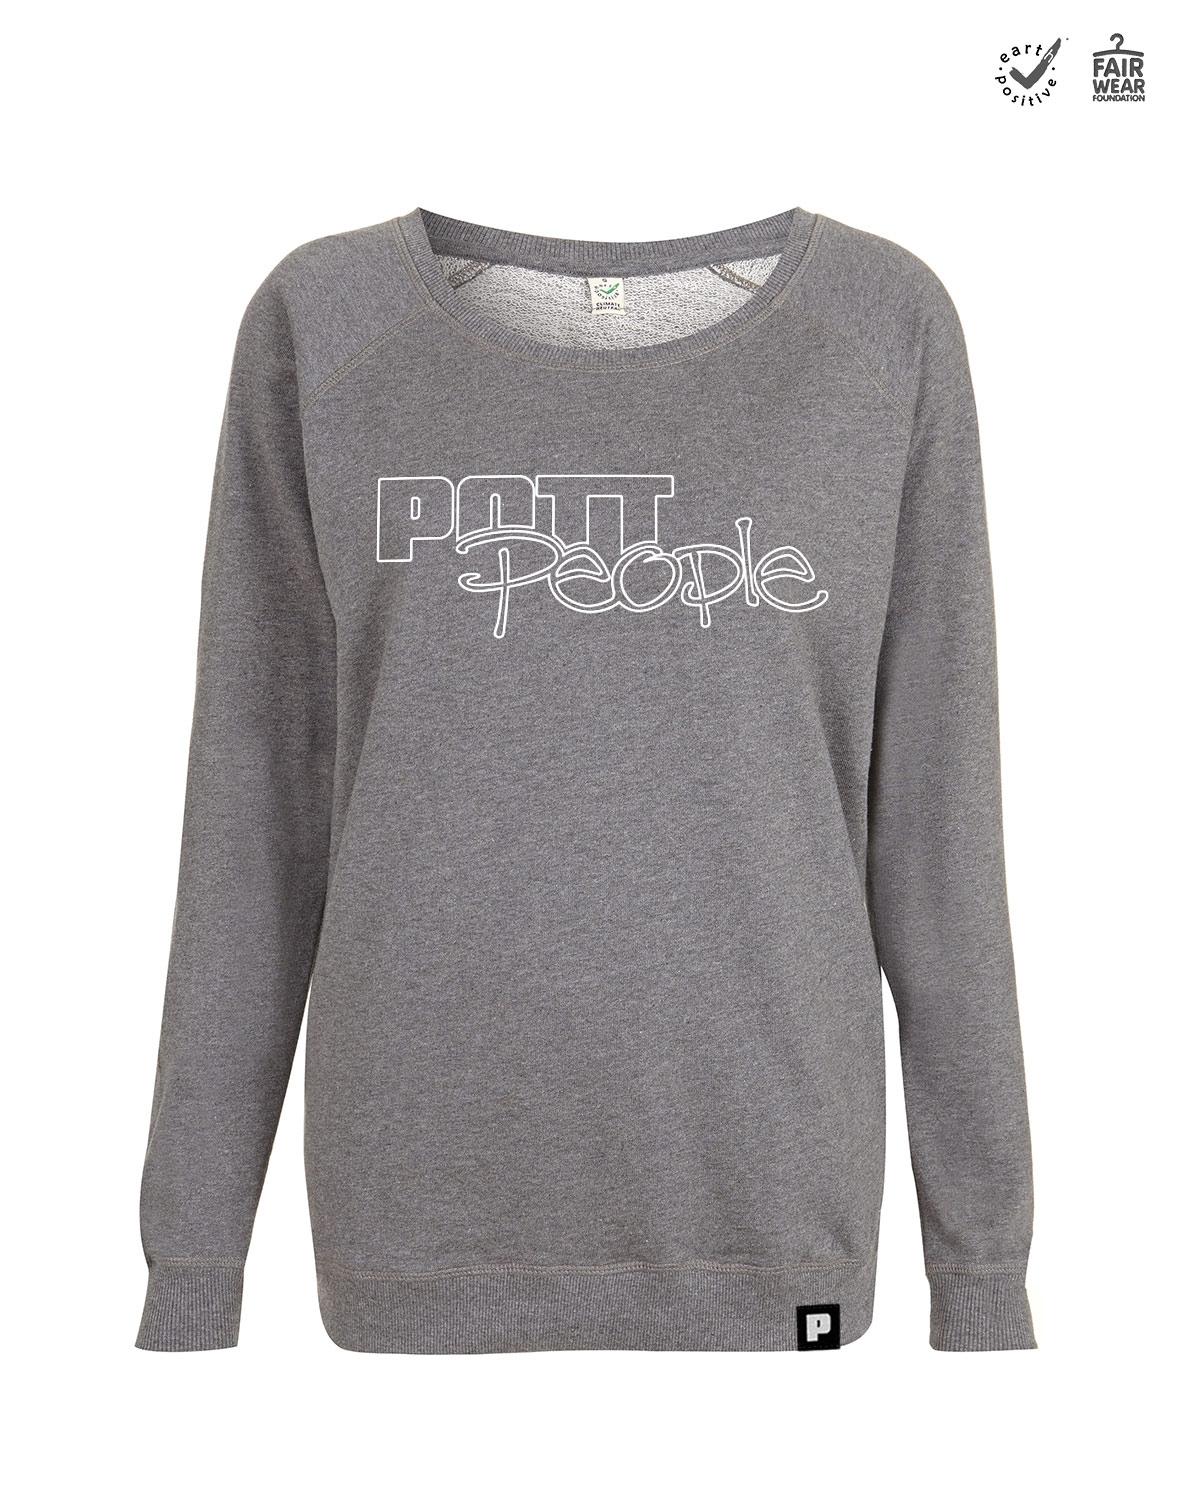 Sweatshirt Damen <br>Grau/Weiss